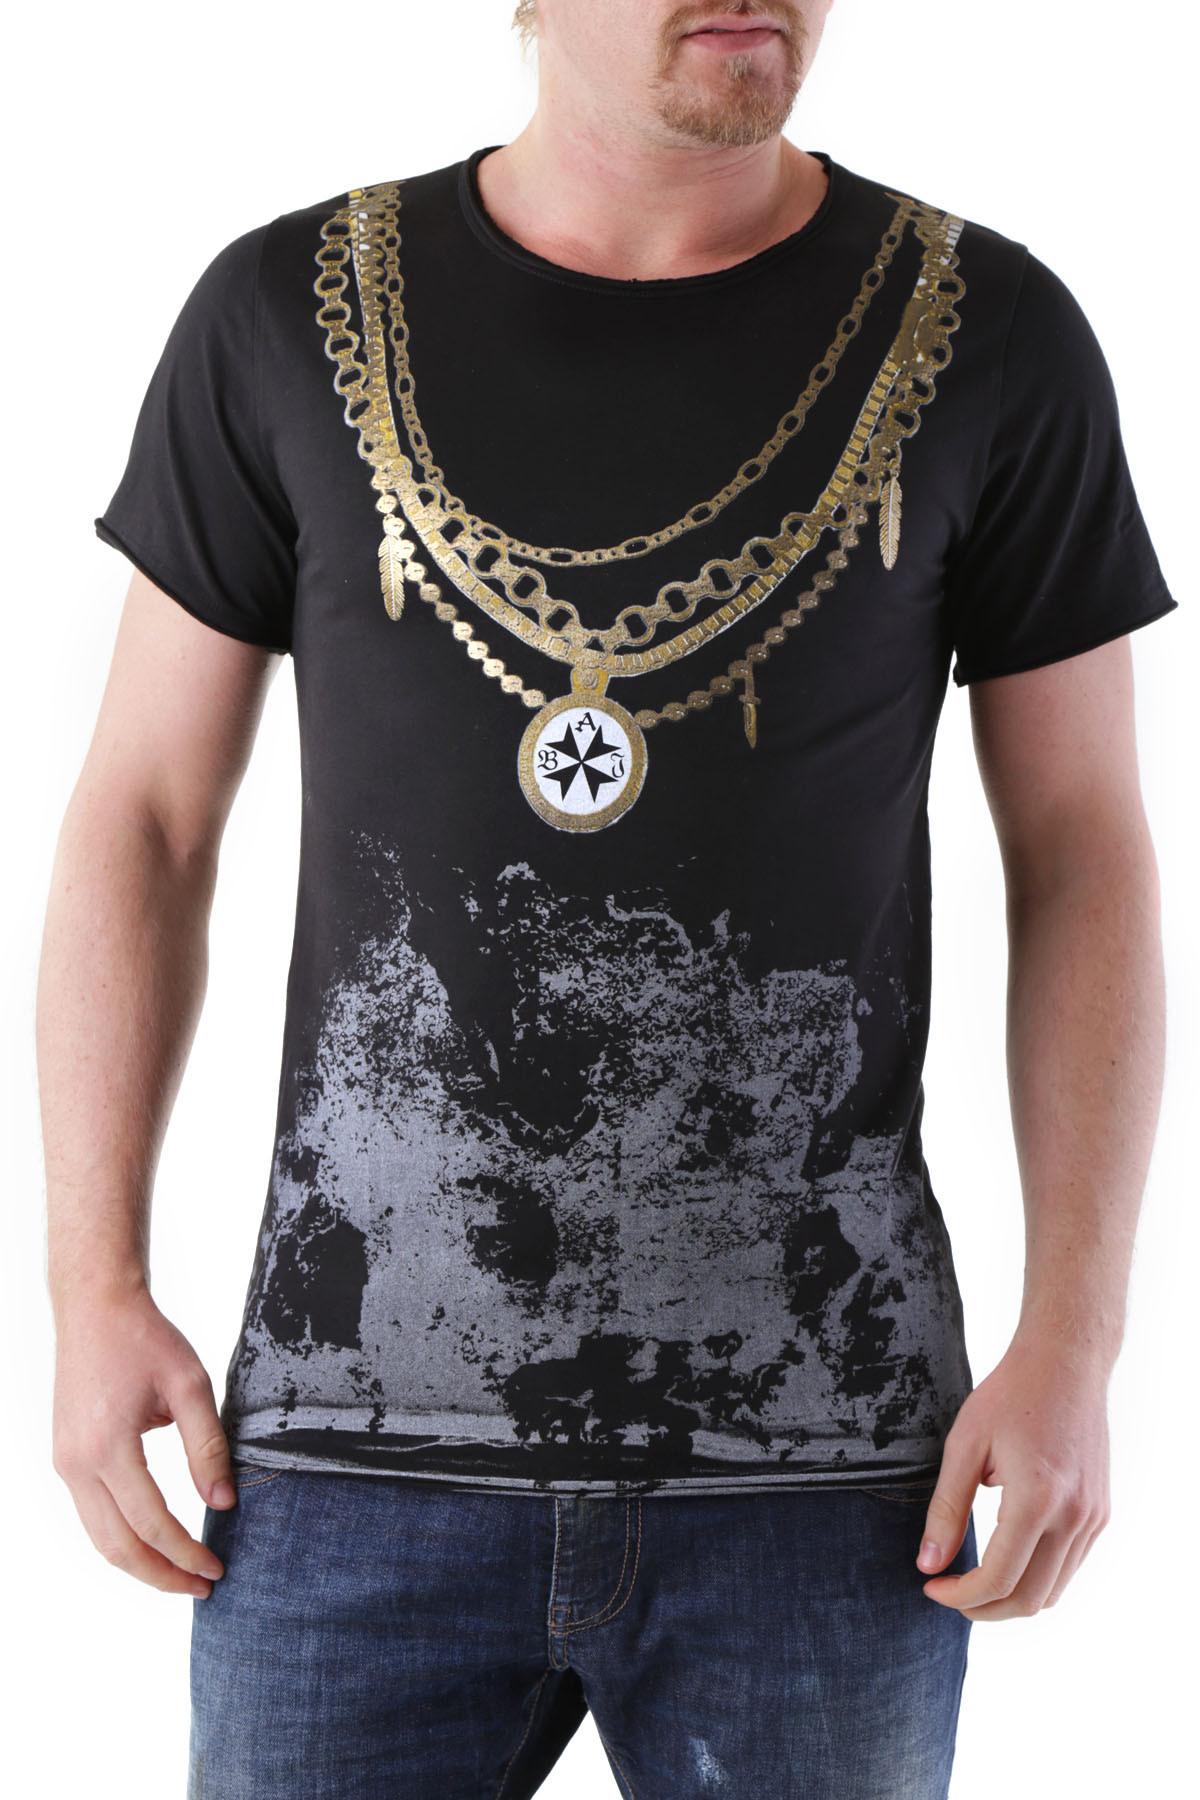 detailed look 9d518 d8e9d WH4-K0476 Absolut Joy T-Shirt Uomo Ingrosso Abbigliamento ...